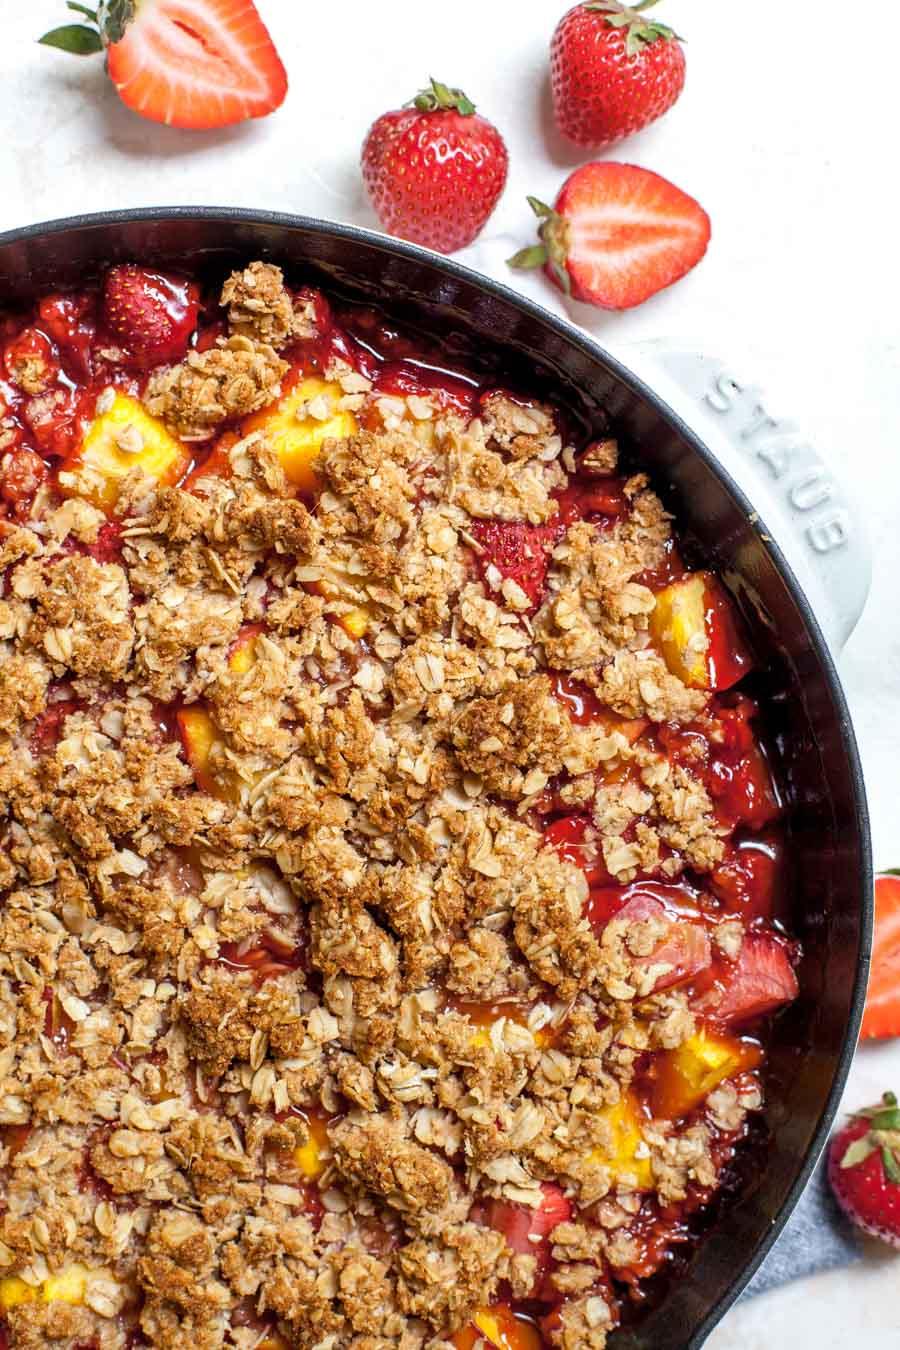 Gluten free fruit crisp with strawberries and nectarines